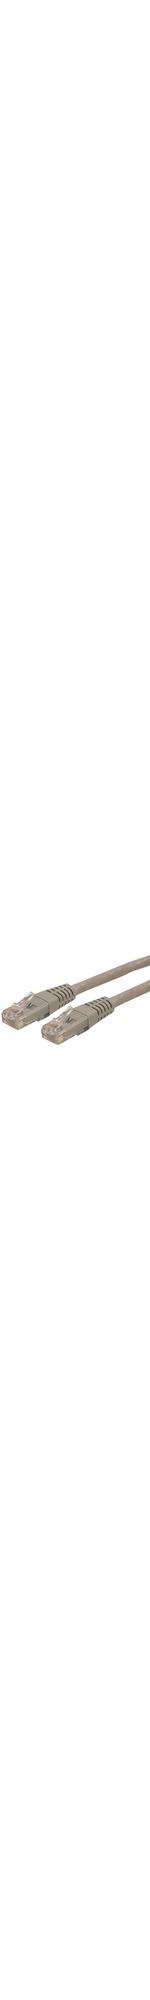 StarTech.com 50 ft Gray Molded Cat6 UTP Patch Cable - ETL Verified - Category 6 - 50ft - Gray